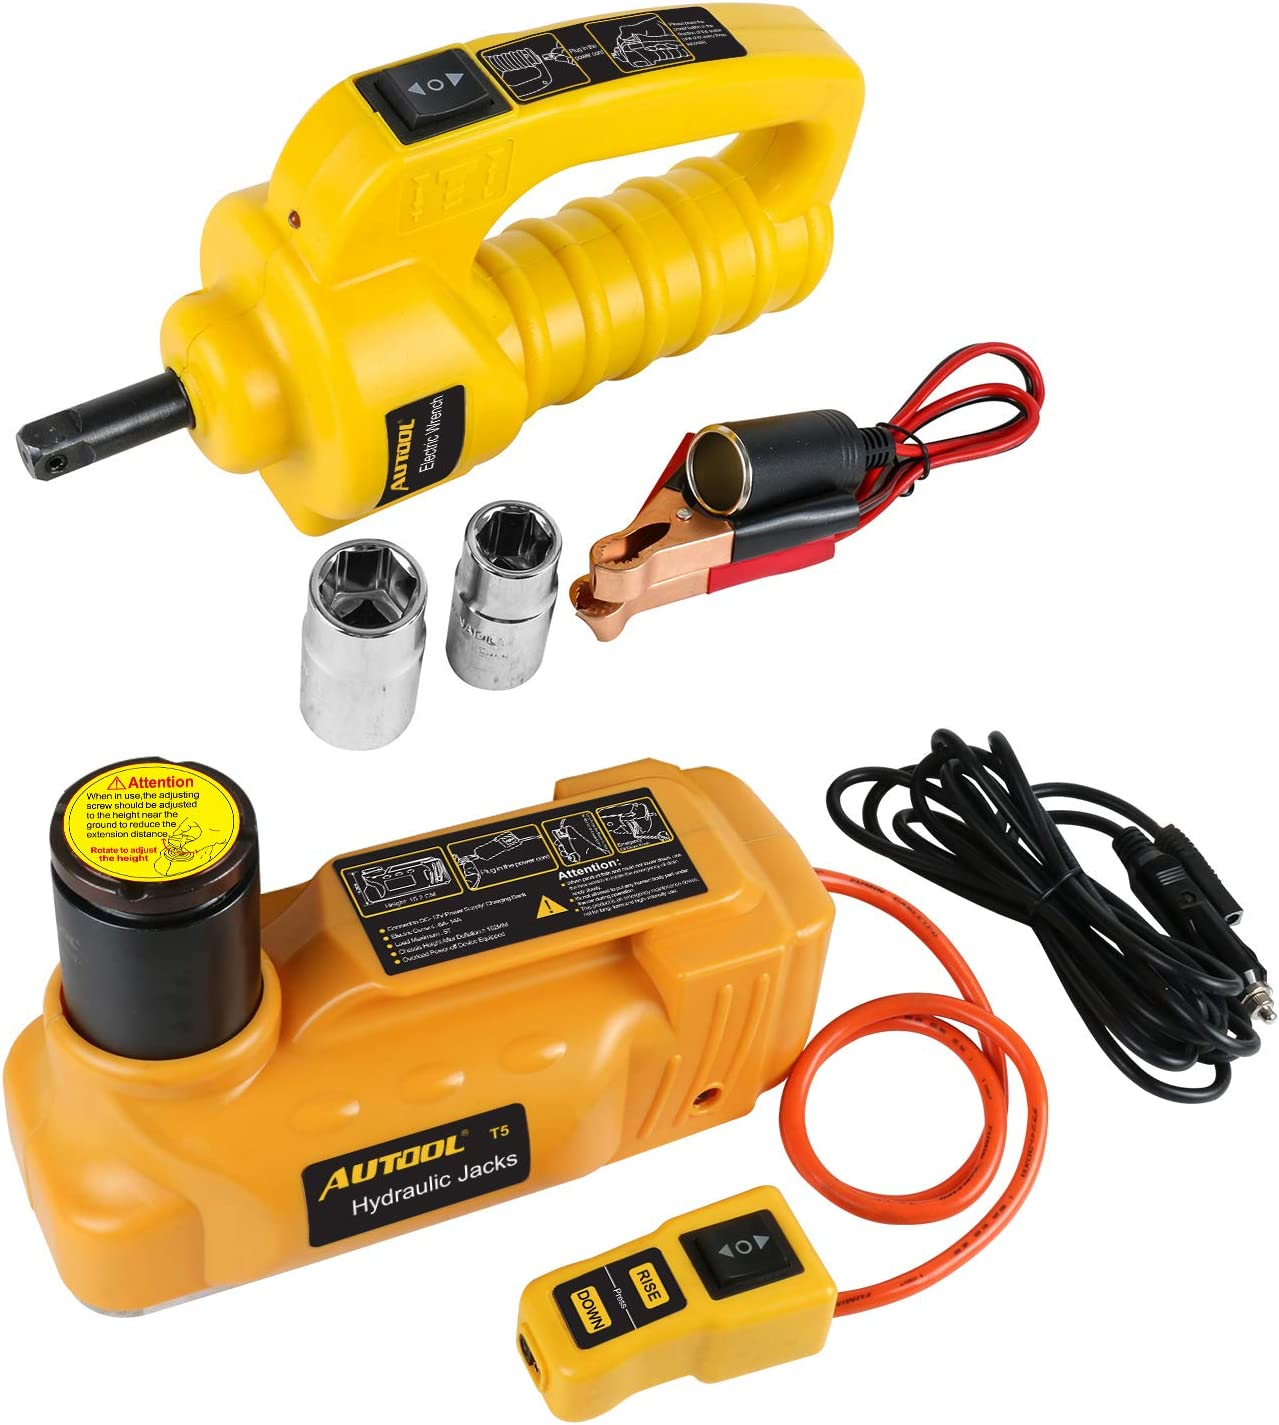 11023LB 12V 5T Hydraulic Electric Hydraulic Floor Jack Portable Vehicle Jacks,Auto Floor Jacks Car Tire /& Wheel Repair Replace Tools Auto Road Emergency Tool AUTOOL 5T